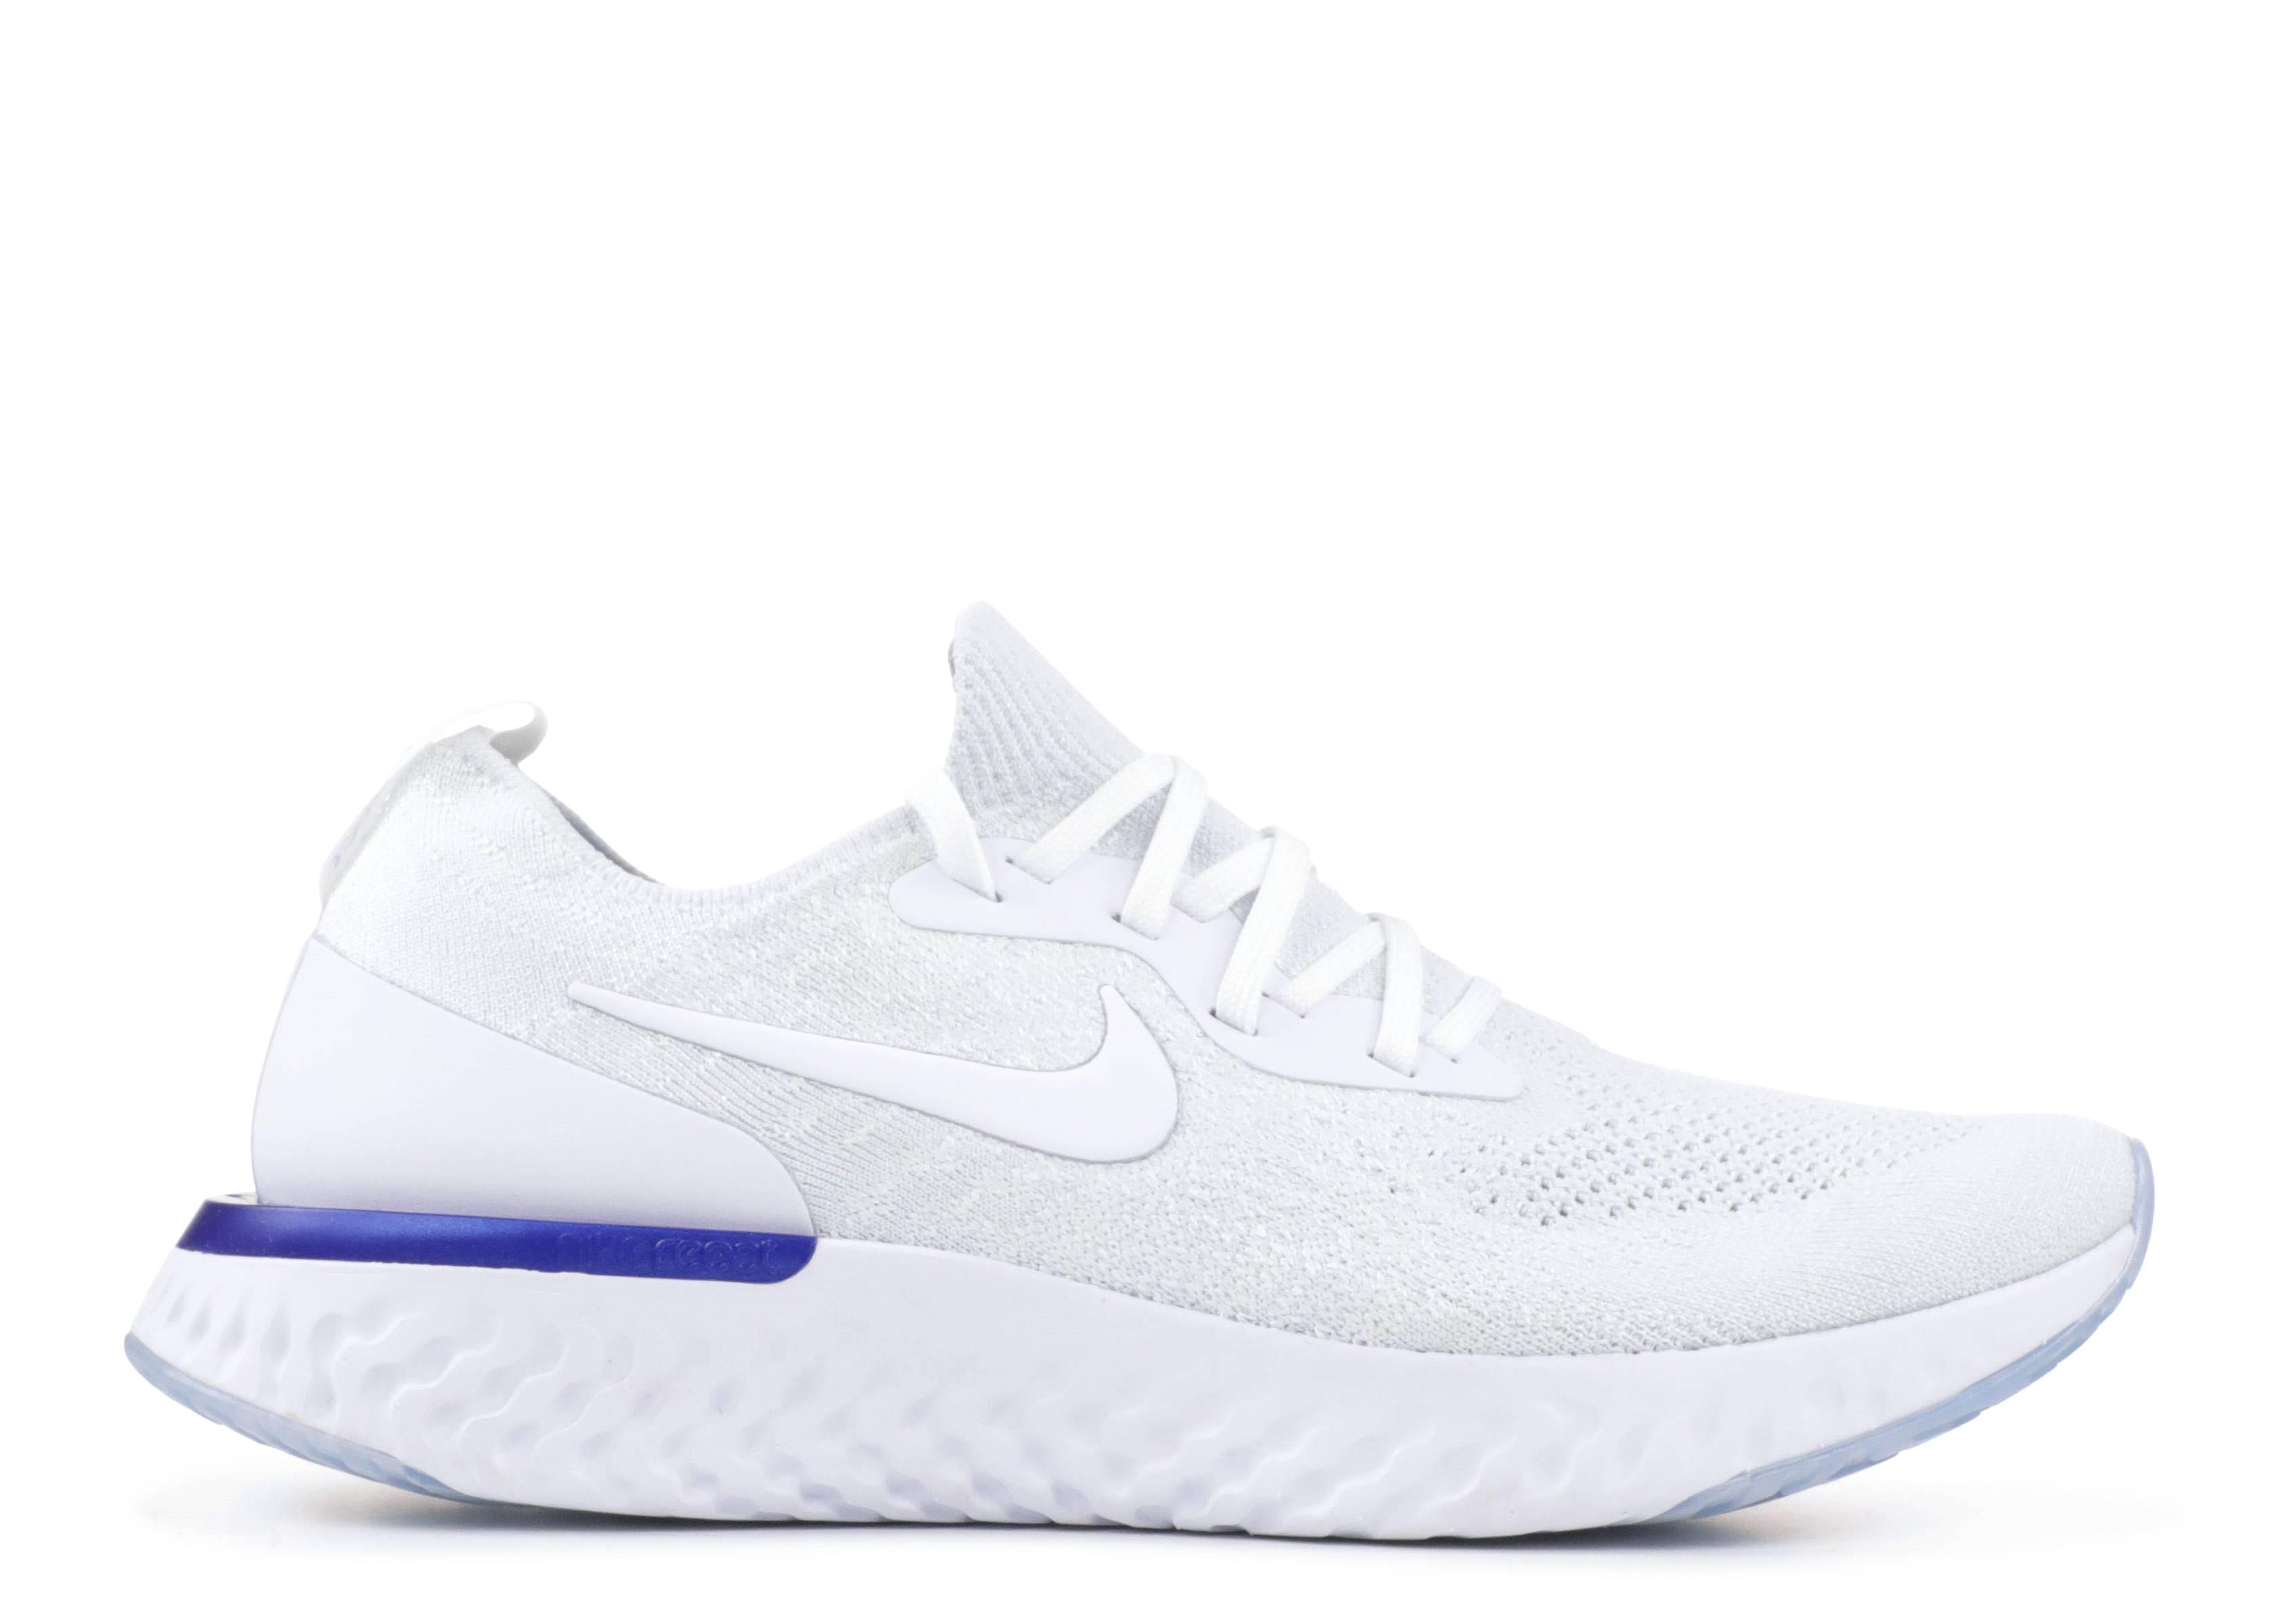 11c368bab6ae Nike Epic React Flyknit - Nike - aq0067 100 - white white-racer blue ...